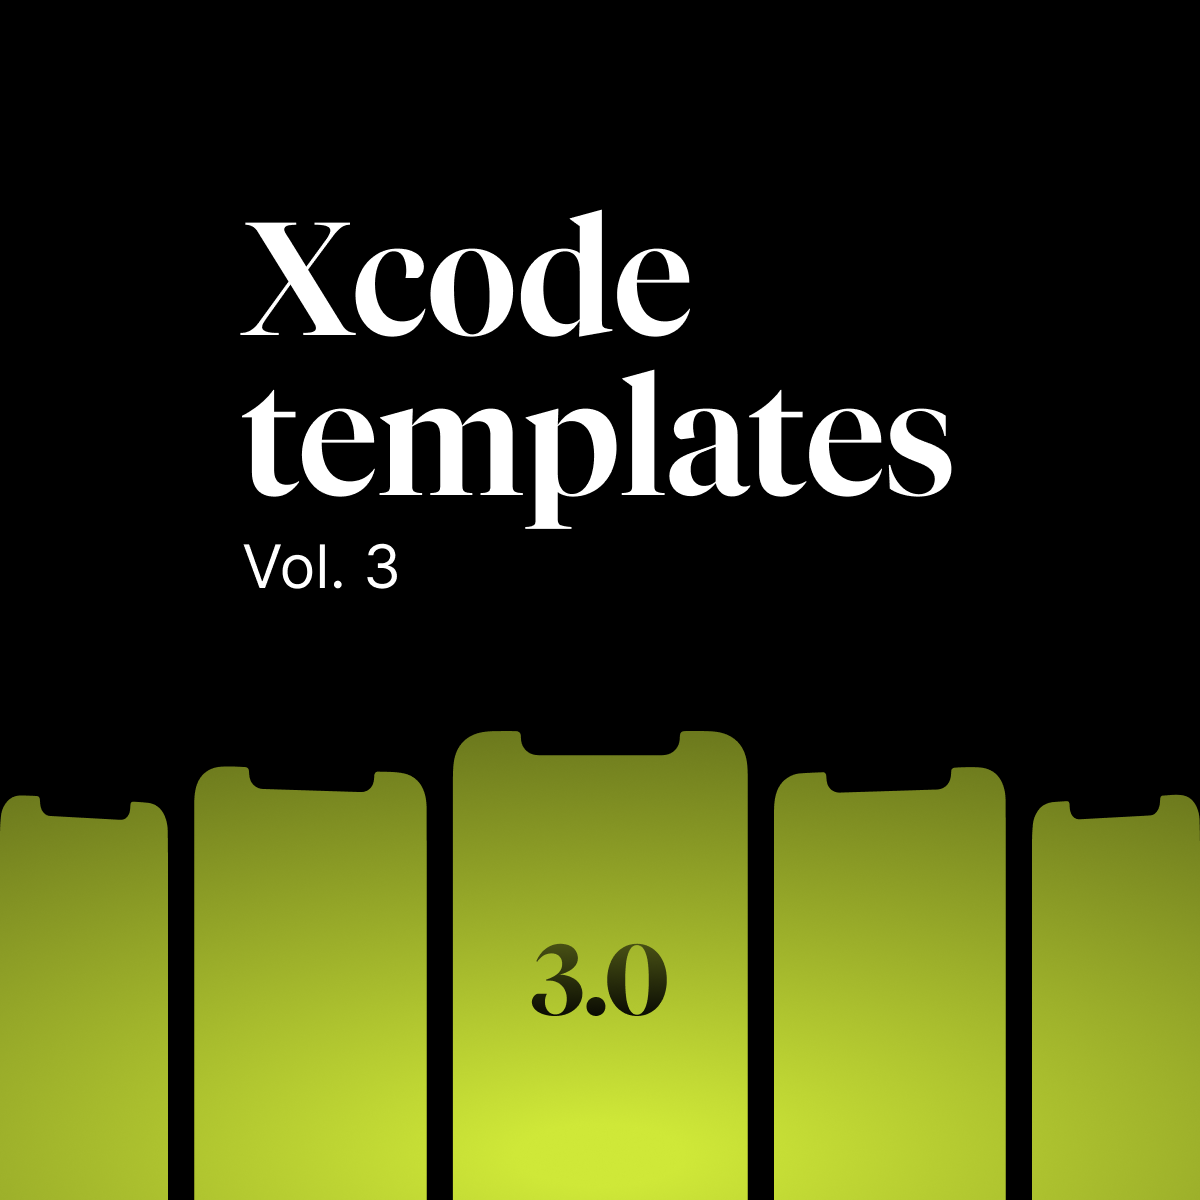 Xcode Templates Vol. 3: Ako automatizovať konfiguráciu swiftlintu a swiftgenu